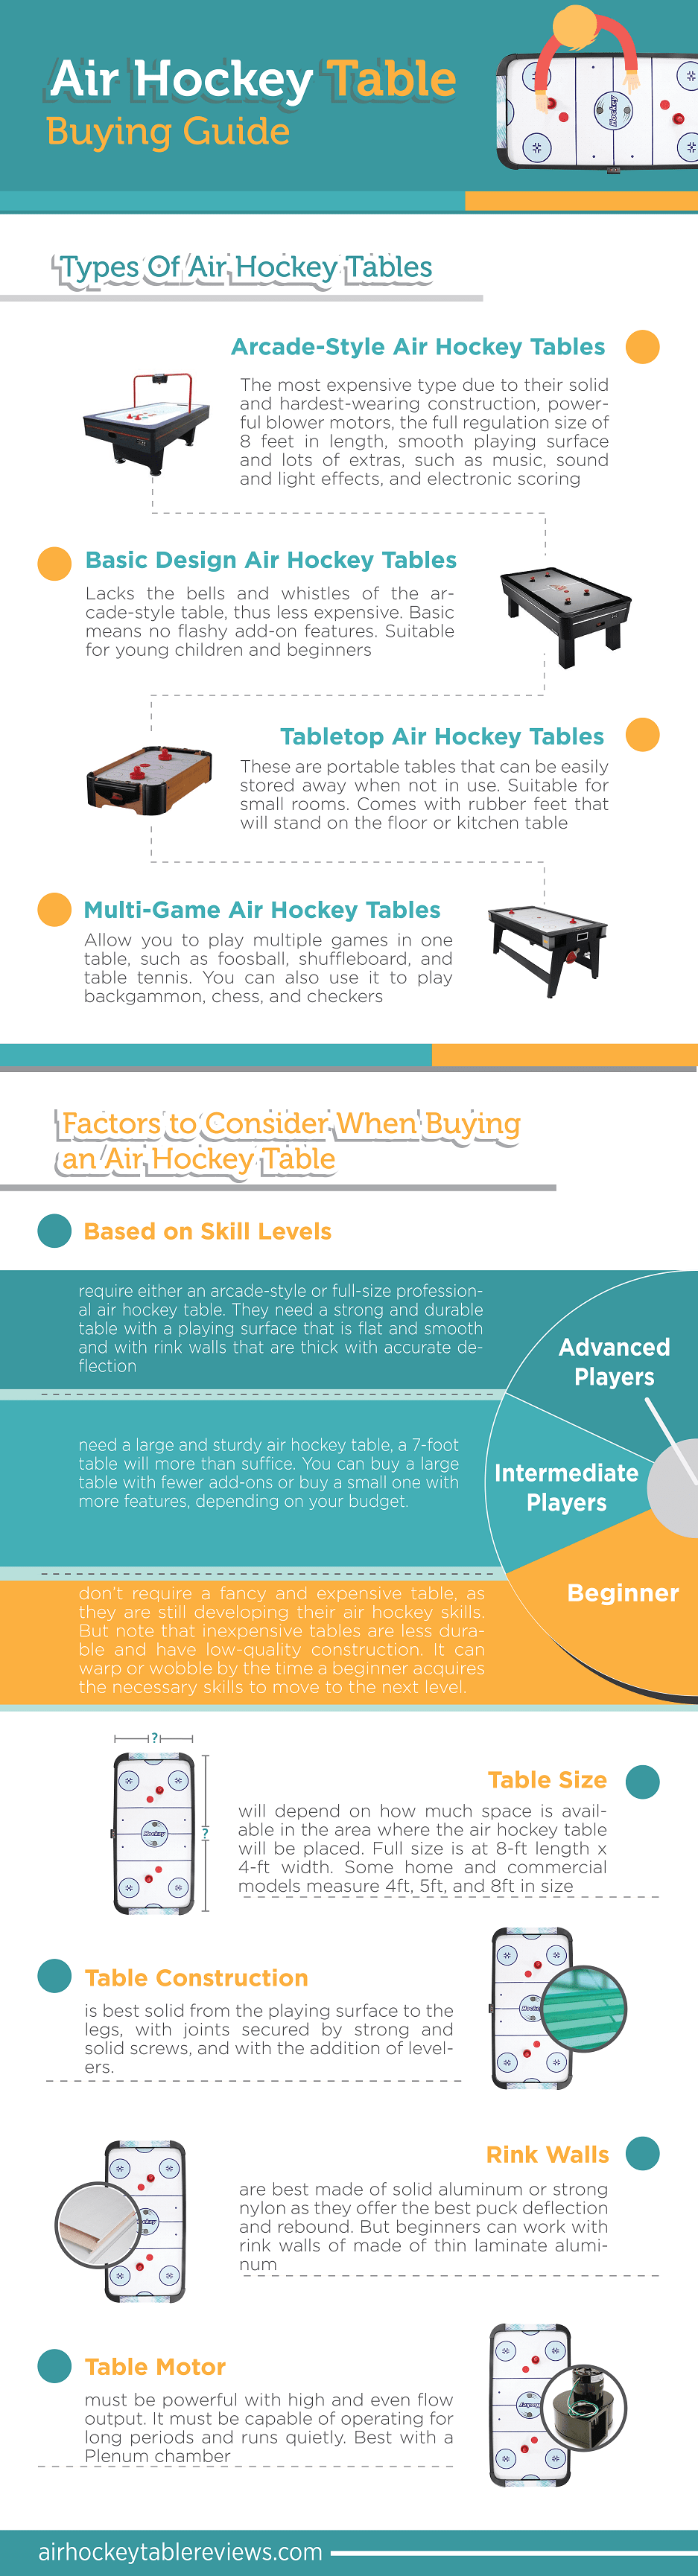 Air Hockey Buying Guide